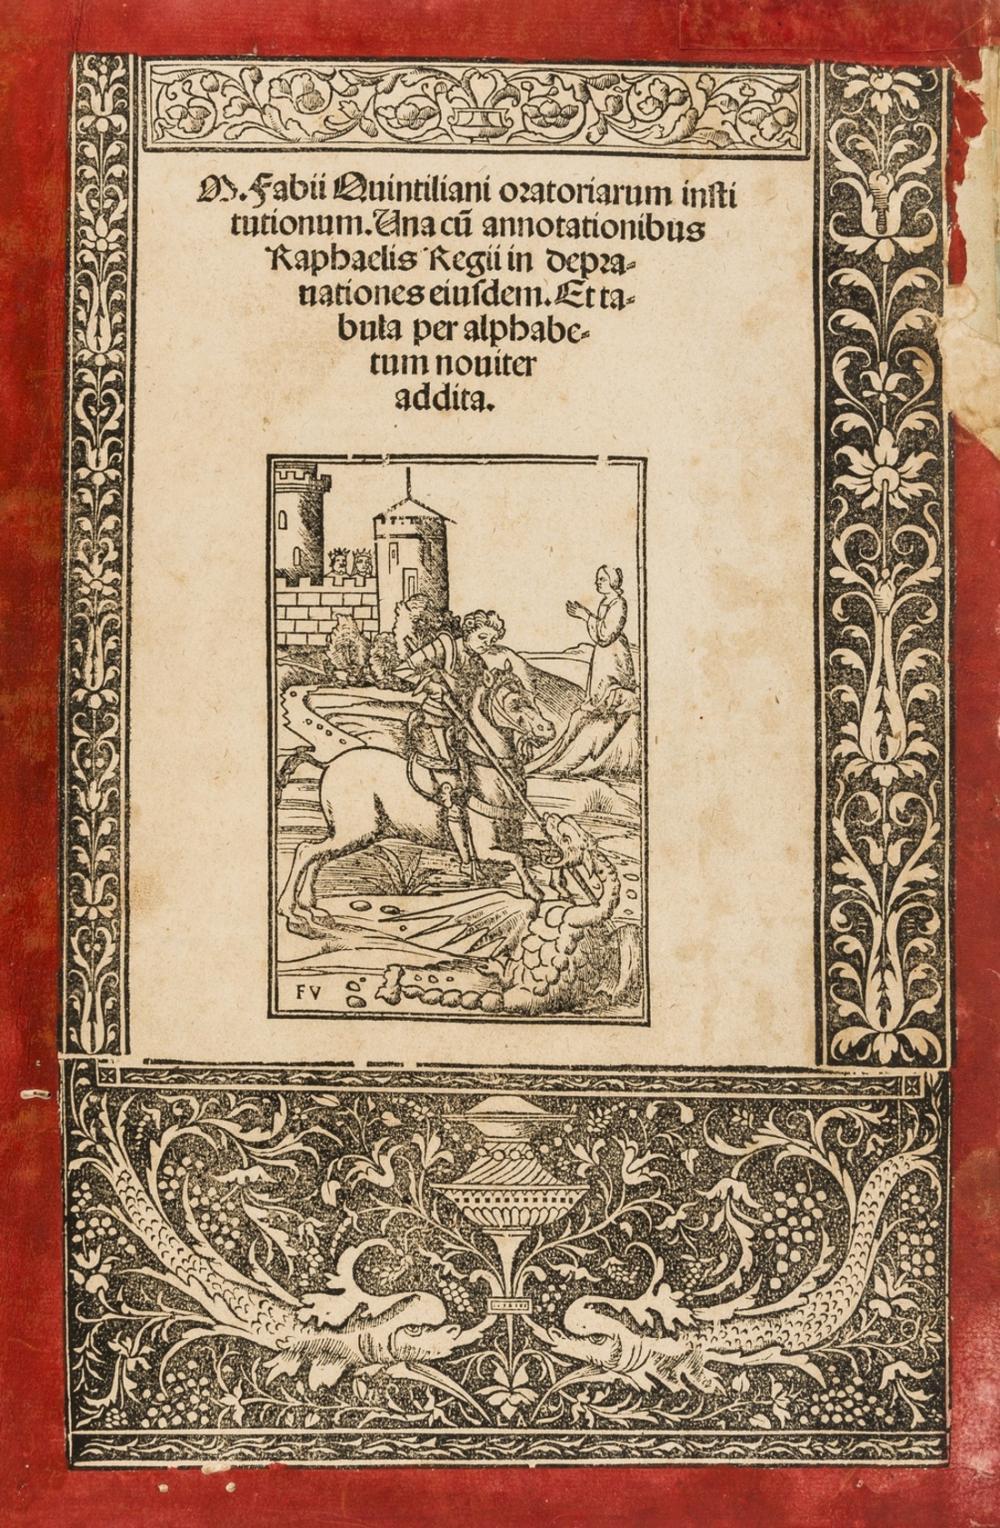 Quintilianus (Marcus Fabius) Oratoriarum institutionum, [Venice], Giorgio Rusconi, 1512; and another copy of the same (water-stained and in a 20th century binding) (2)